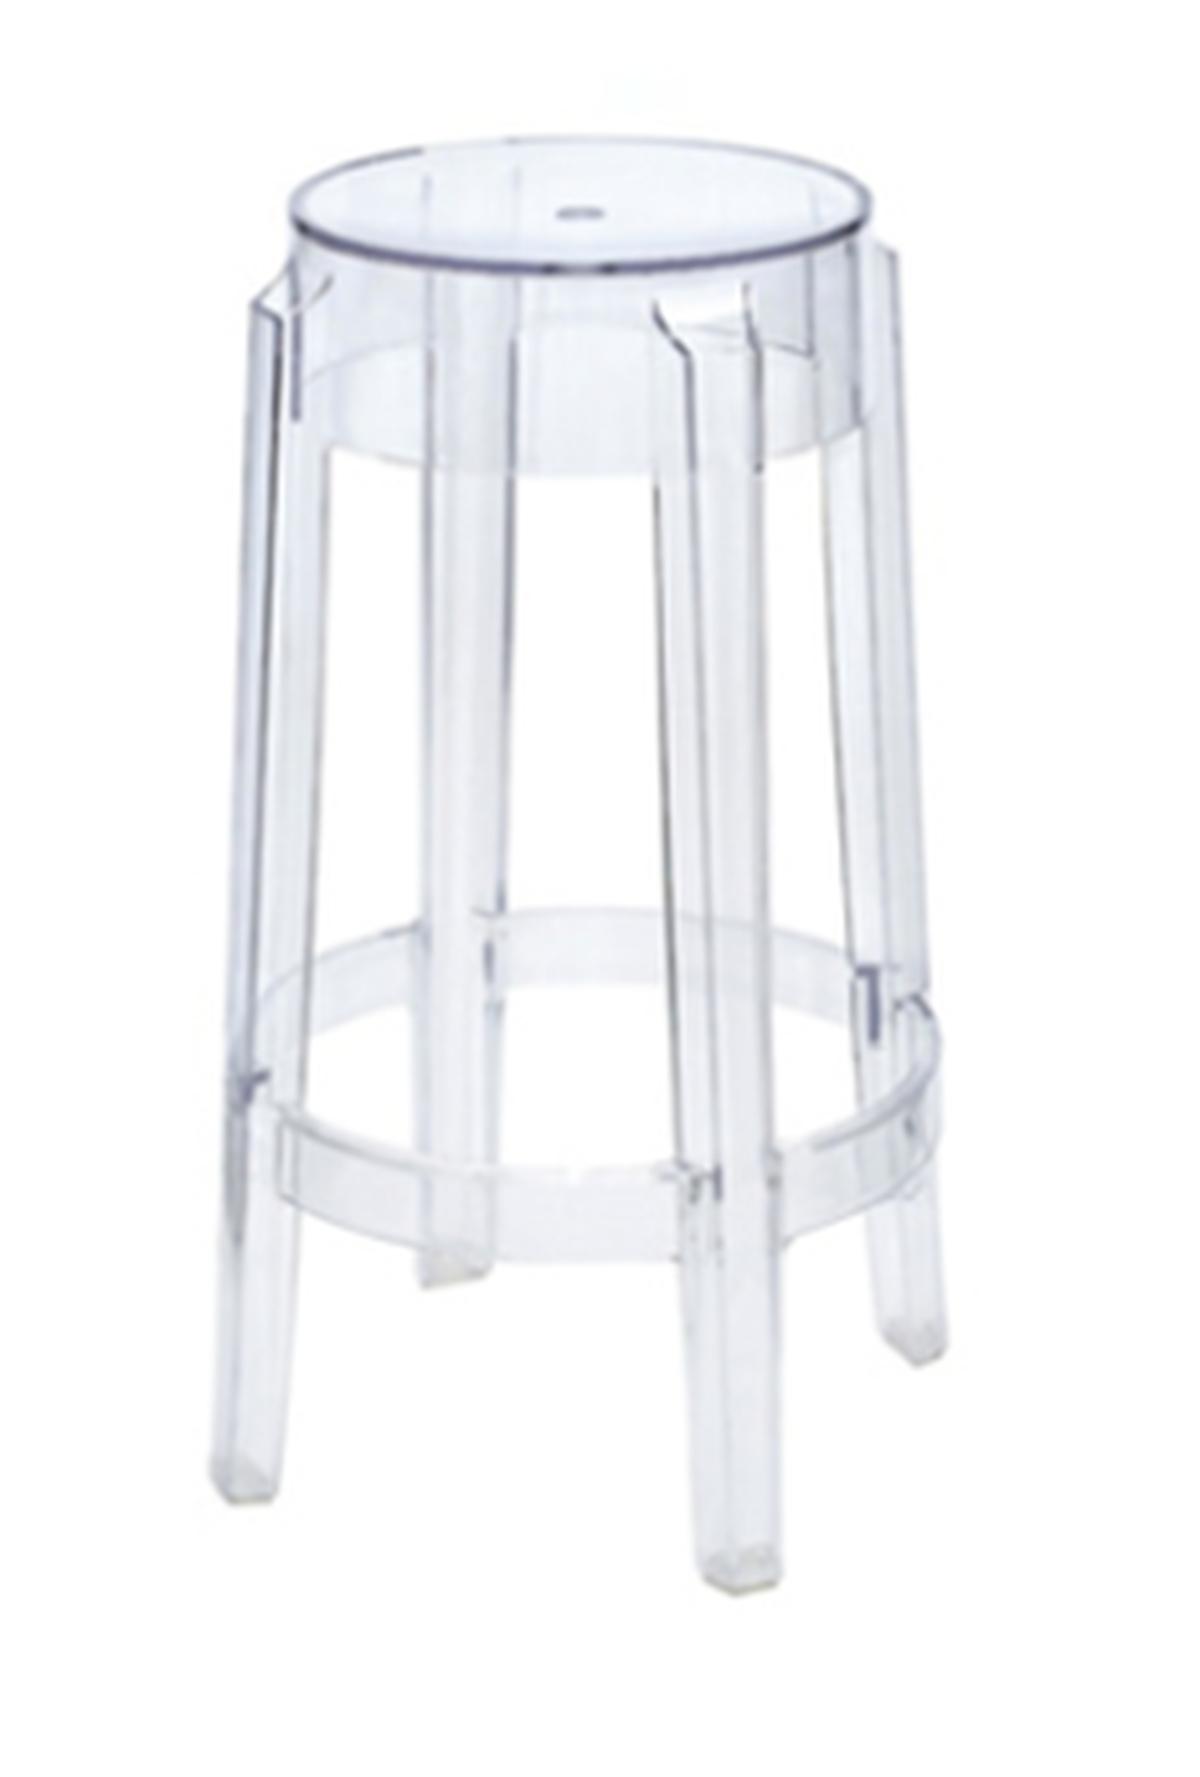 Philippe starck ghost bar stool